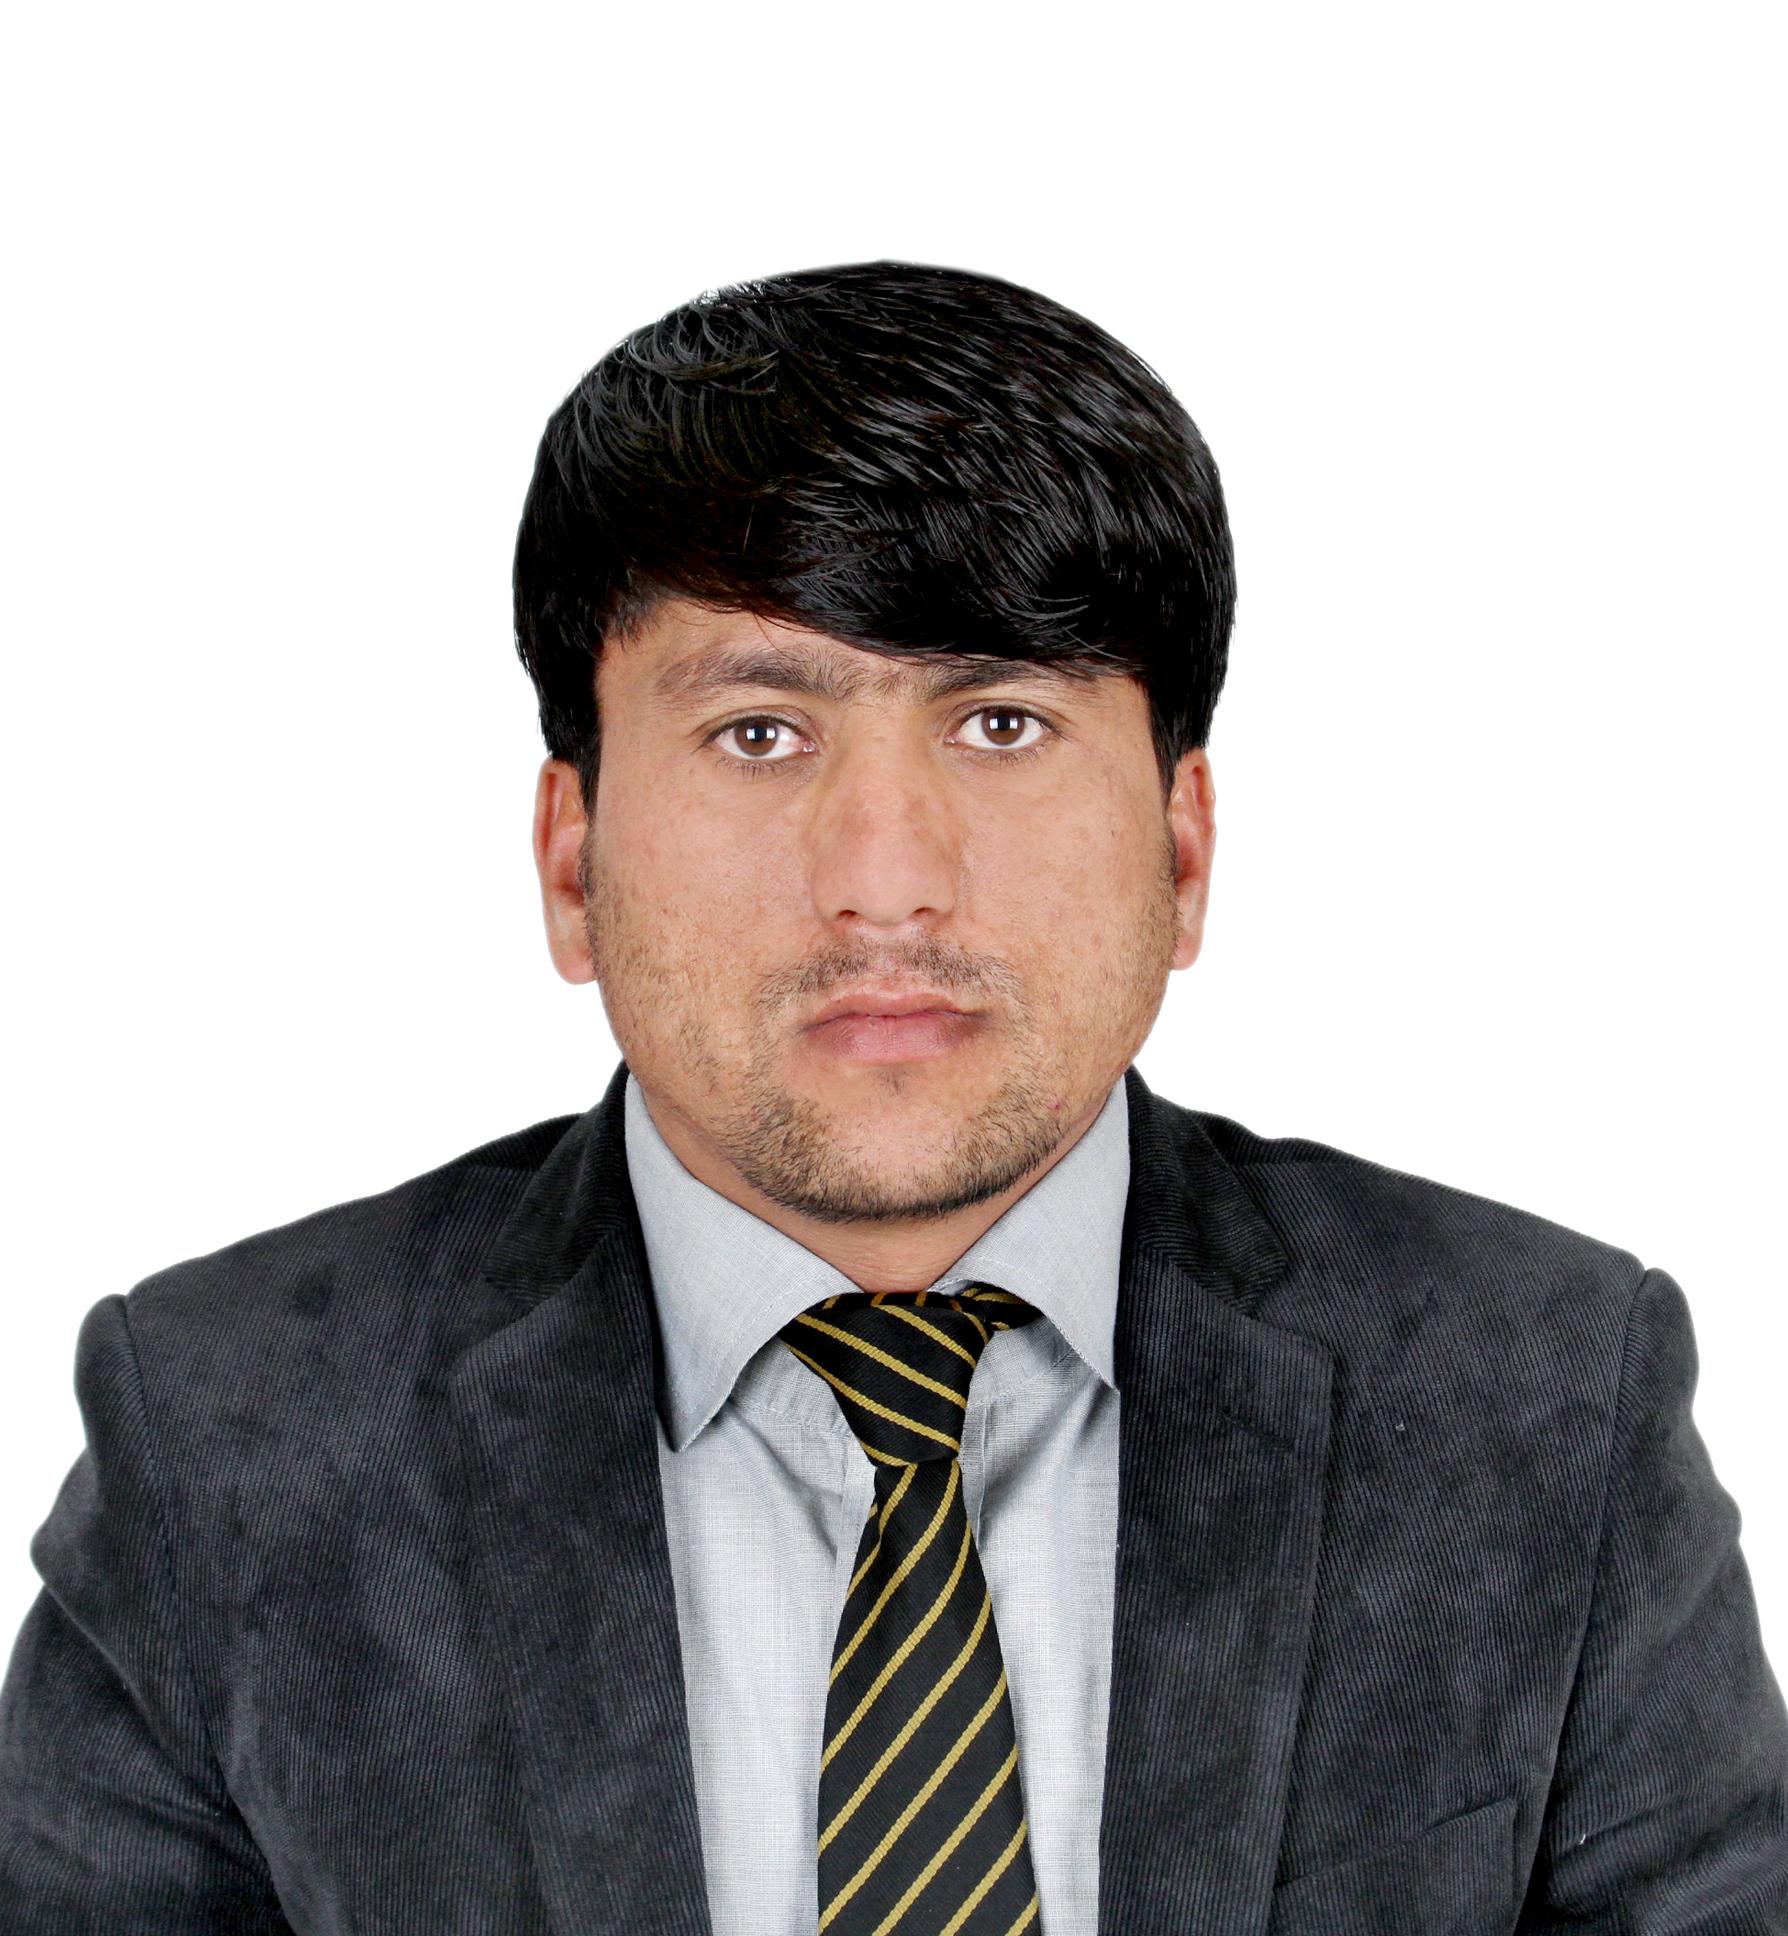 Mr. Najeeb Jamshady is Operations Manager